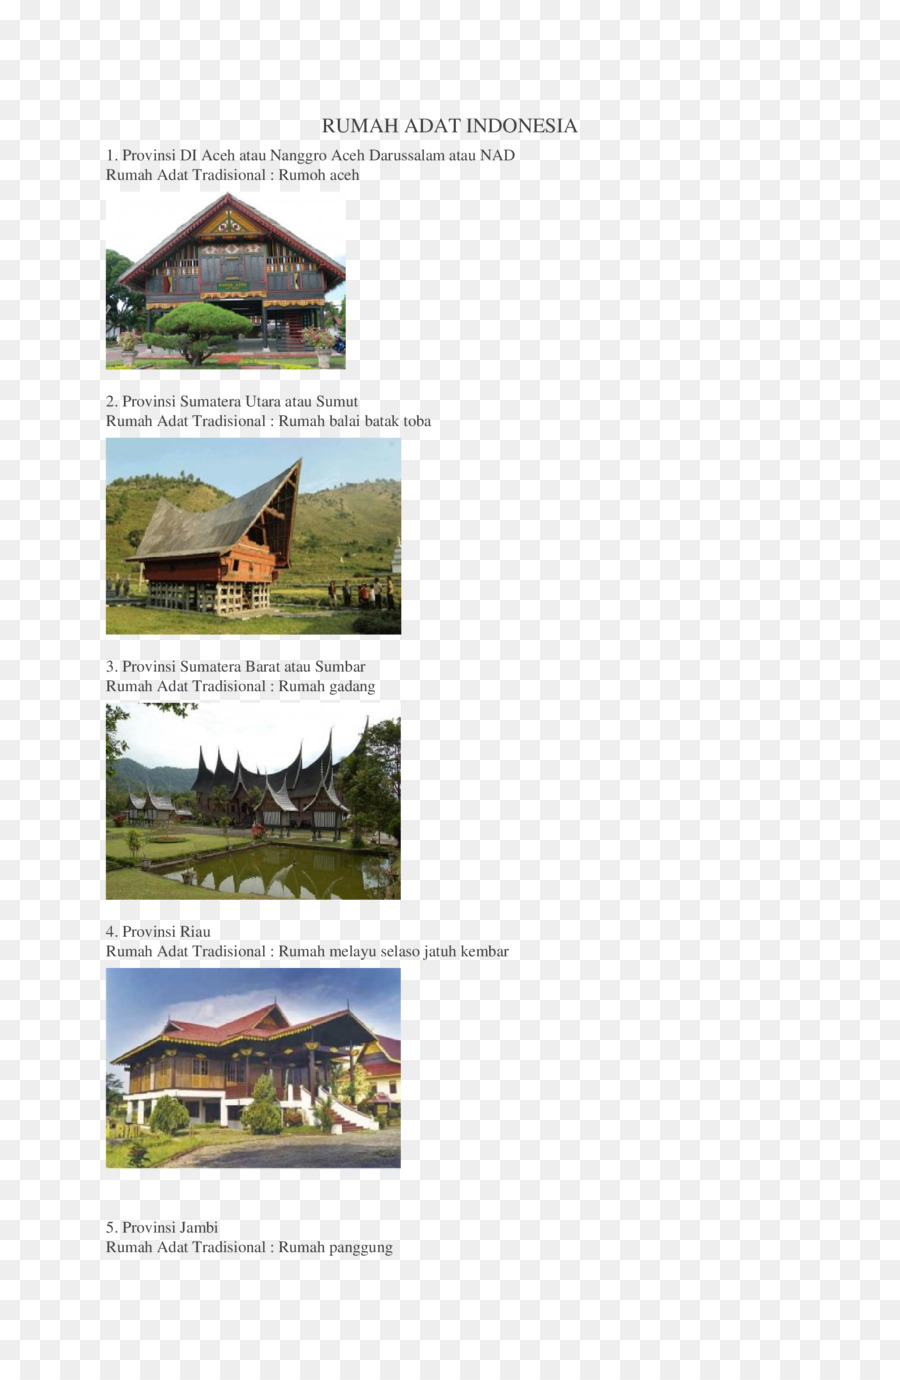 42 Koleksi Gambar Rumah Adat Yang Ada Di Sumatera Utara Terbaru